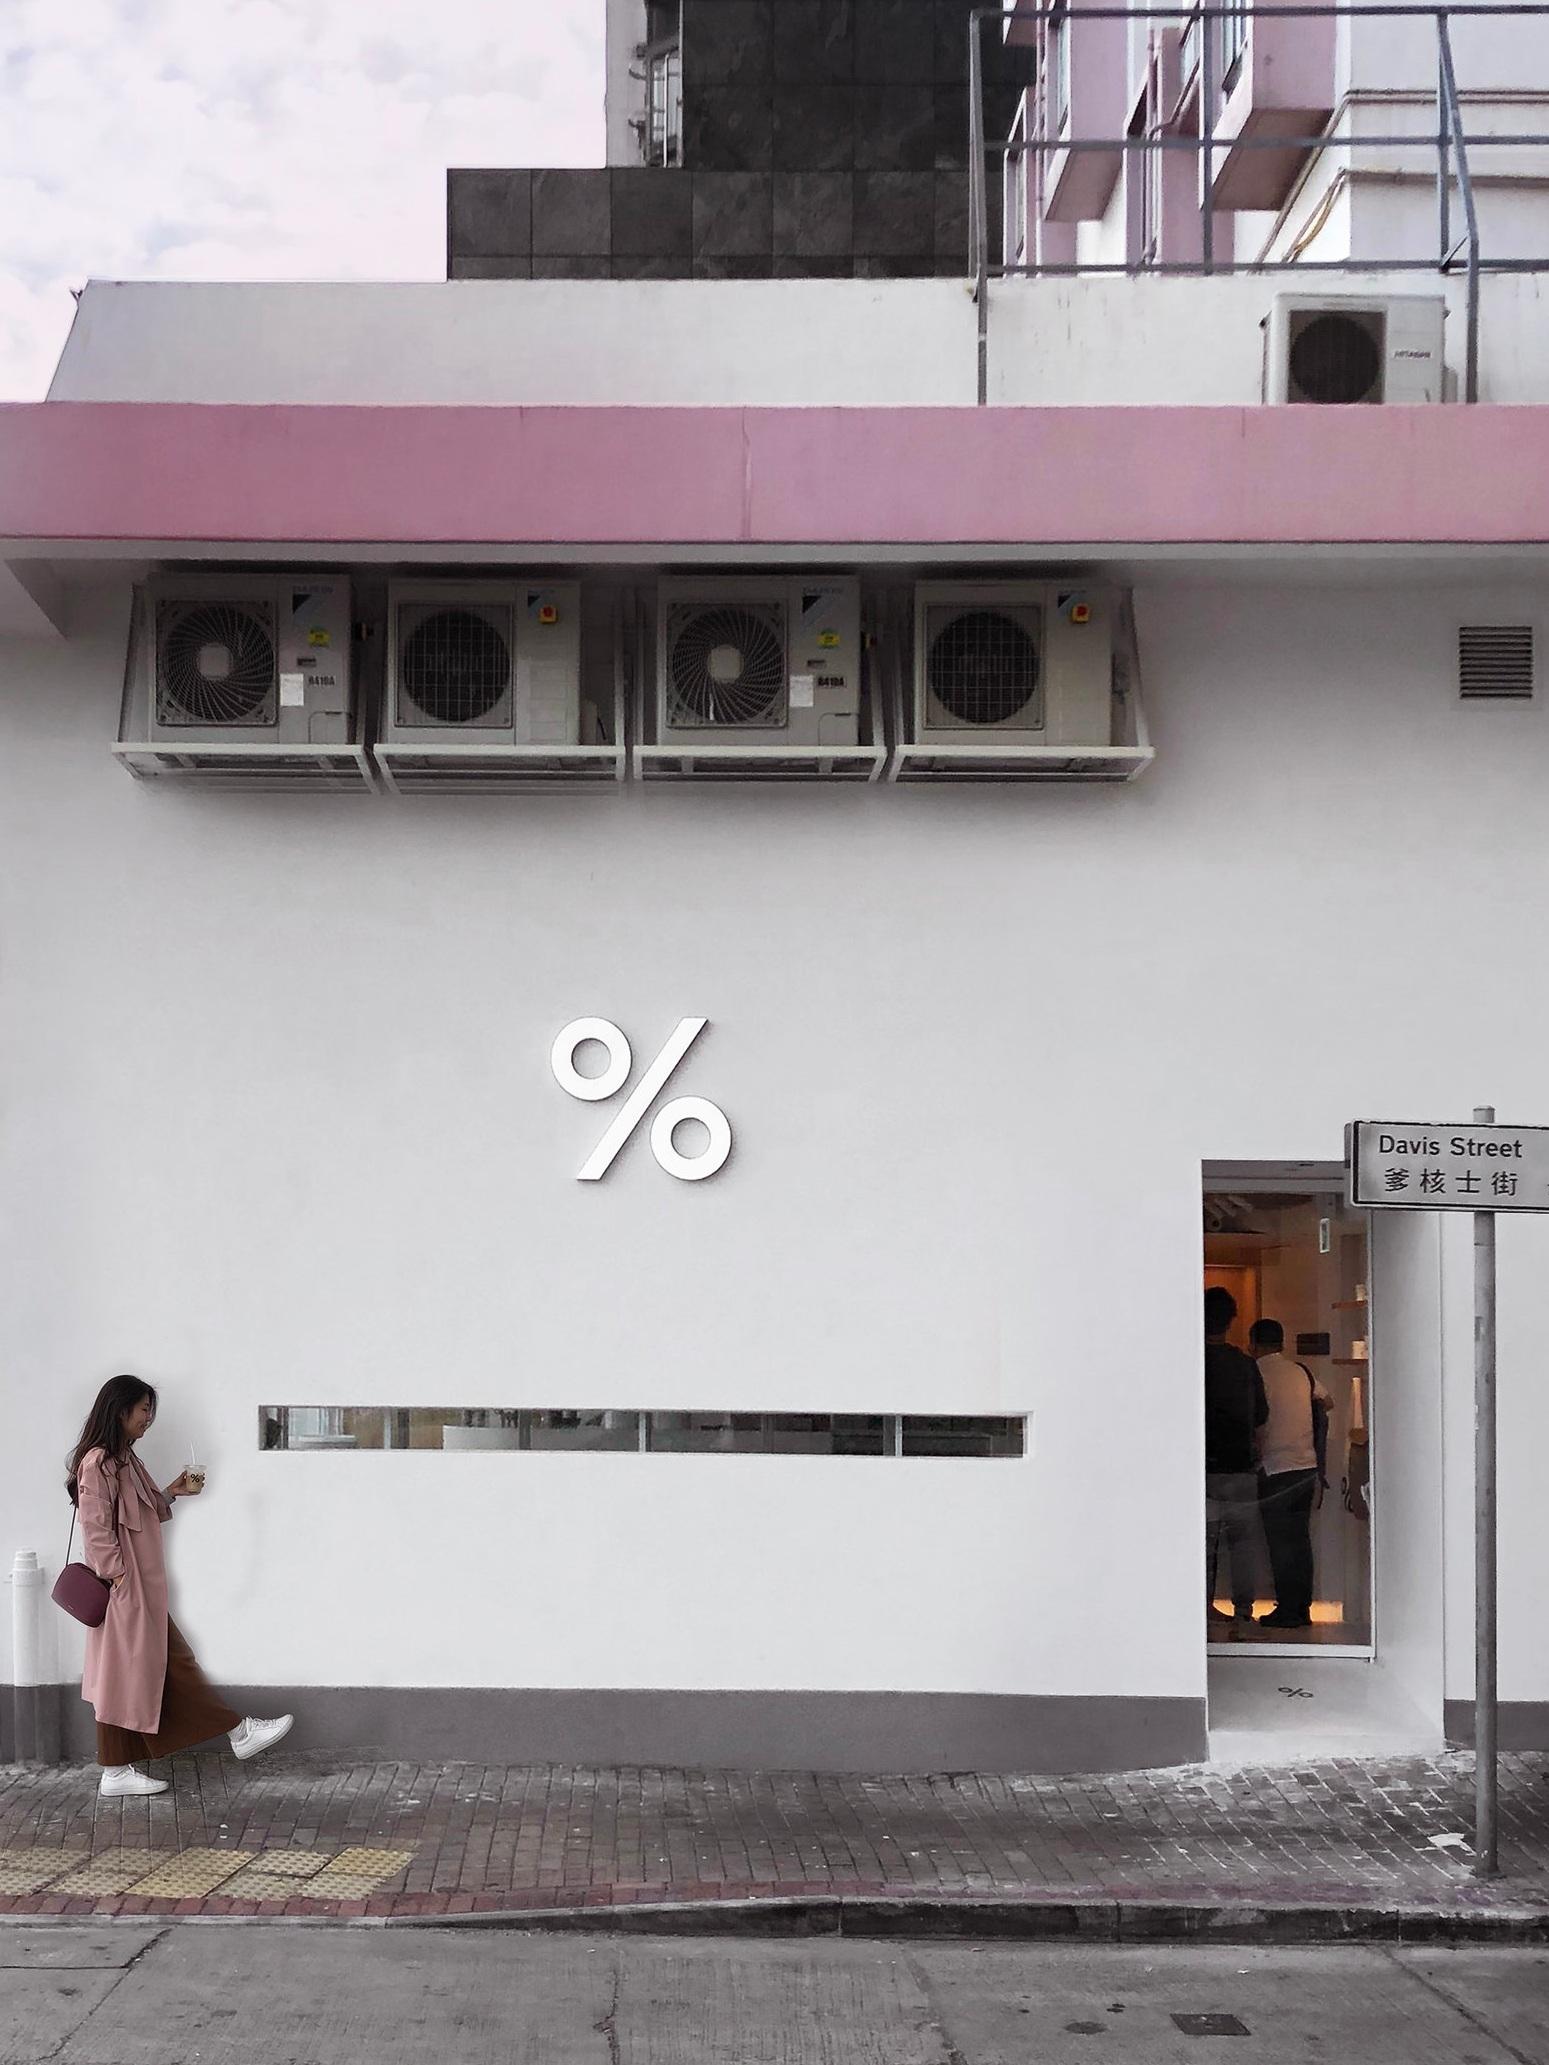 % - % ARABICA KENNEDY TOWN